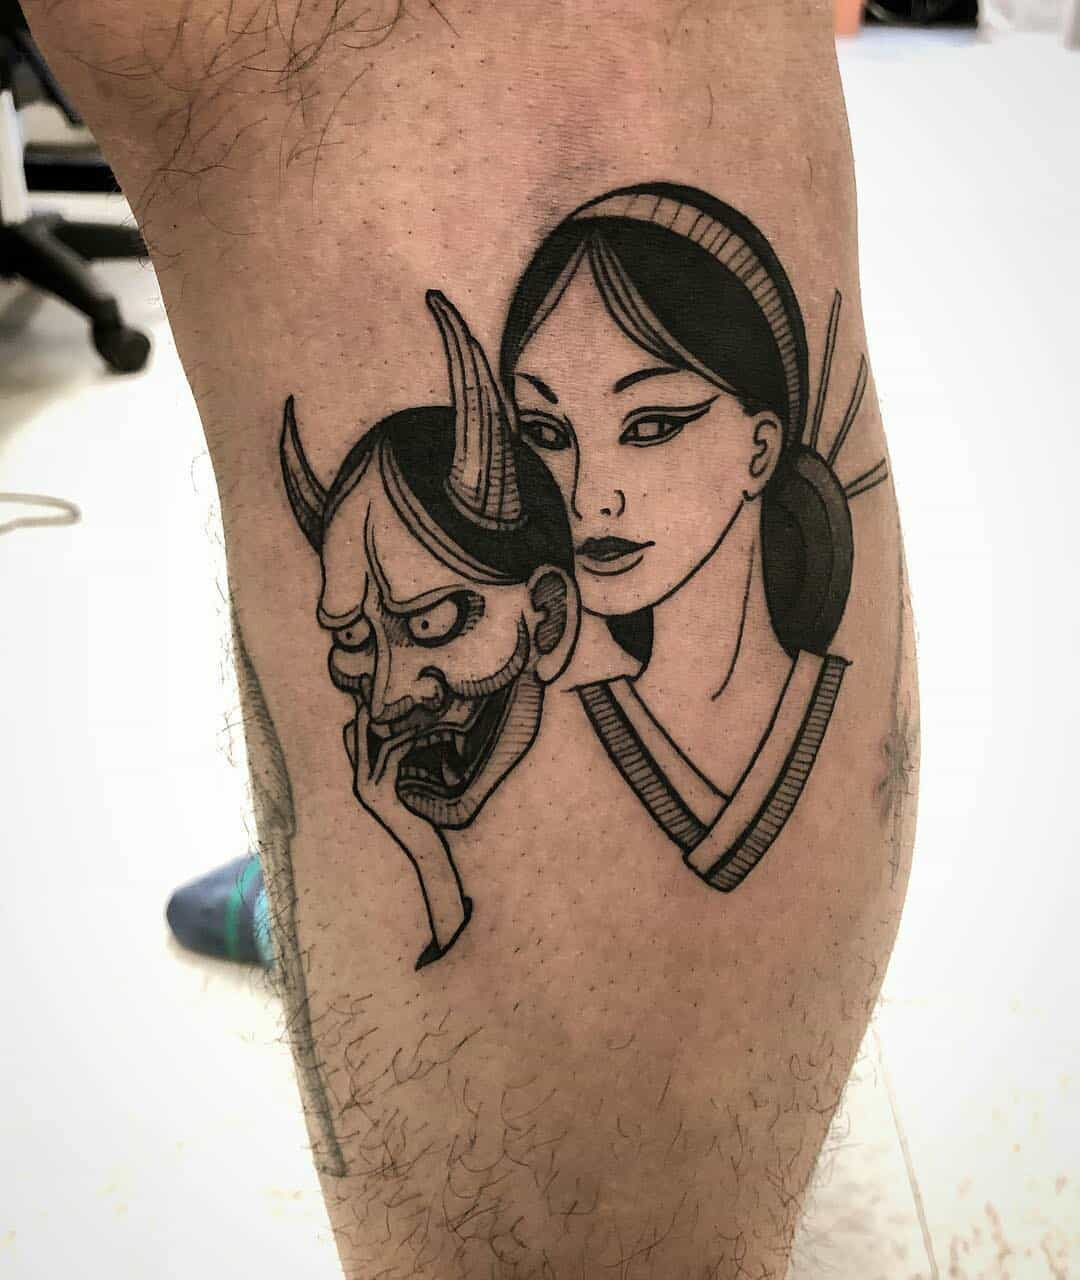 Tattoo by @amyjiaotattoo